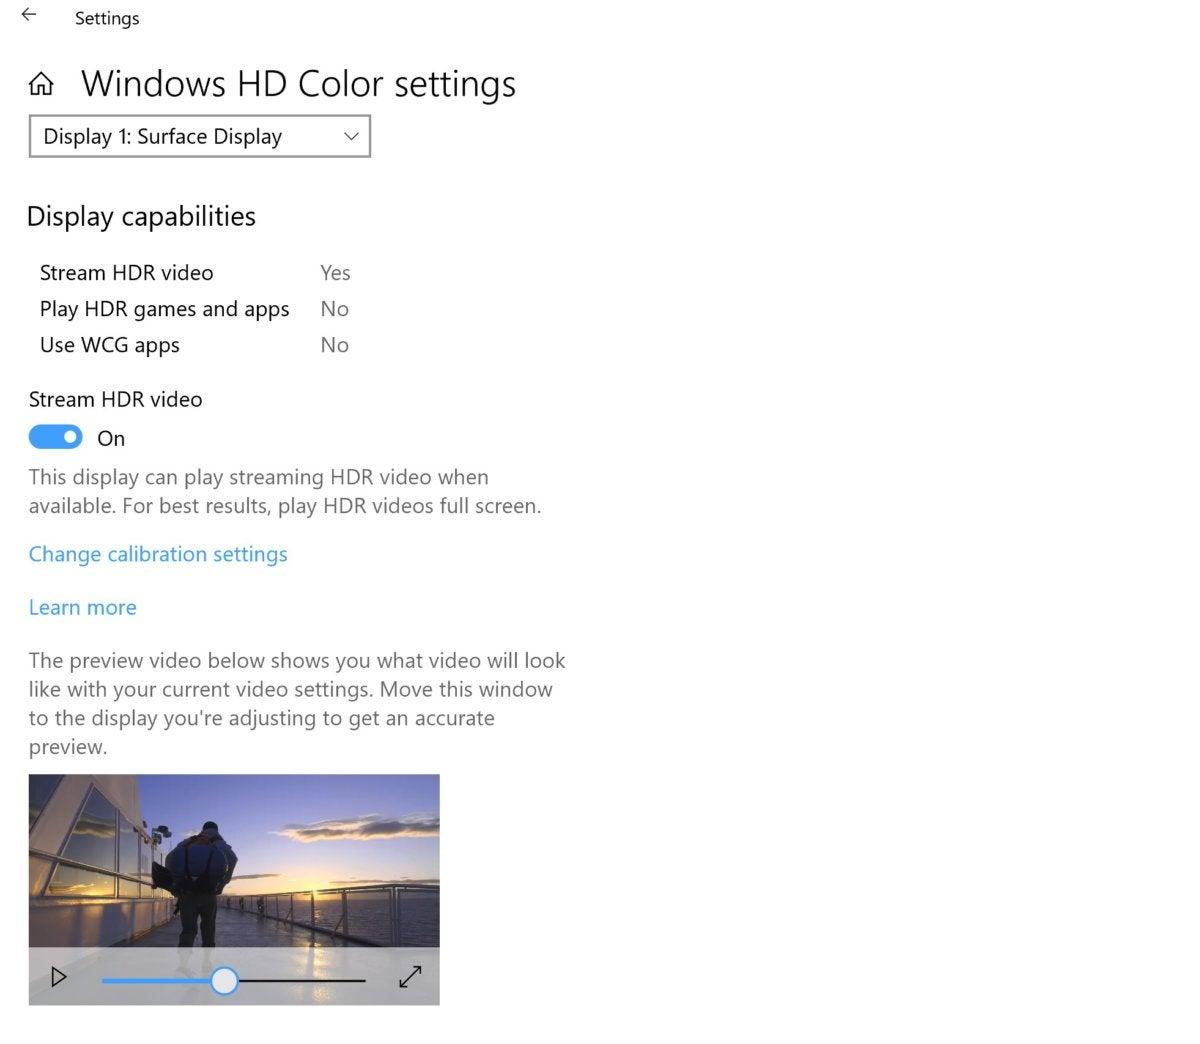 windows hd color settings Windows 10 October 2018 microsoft